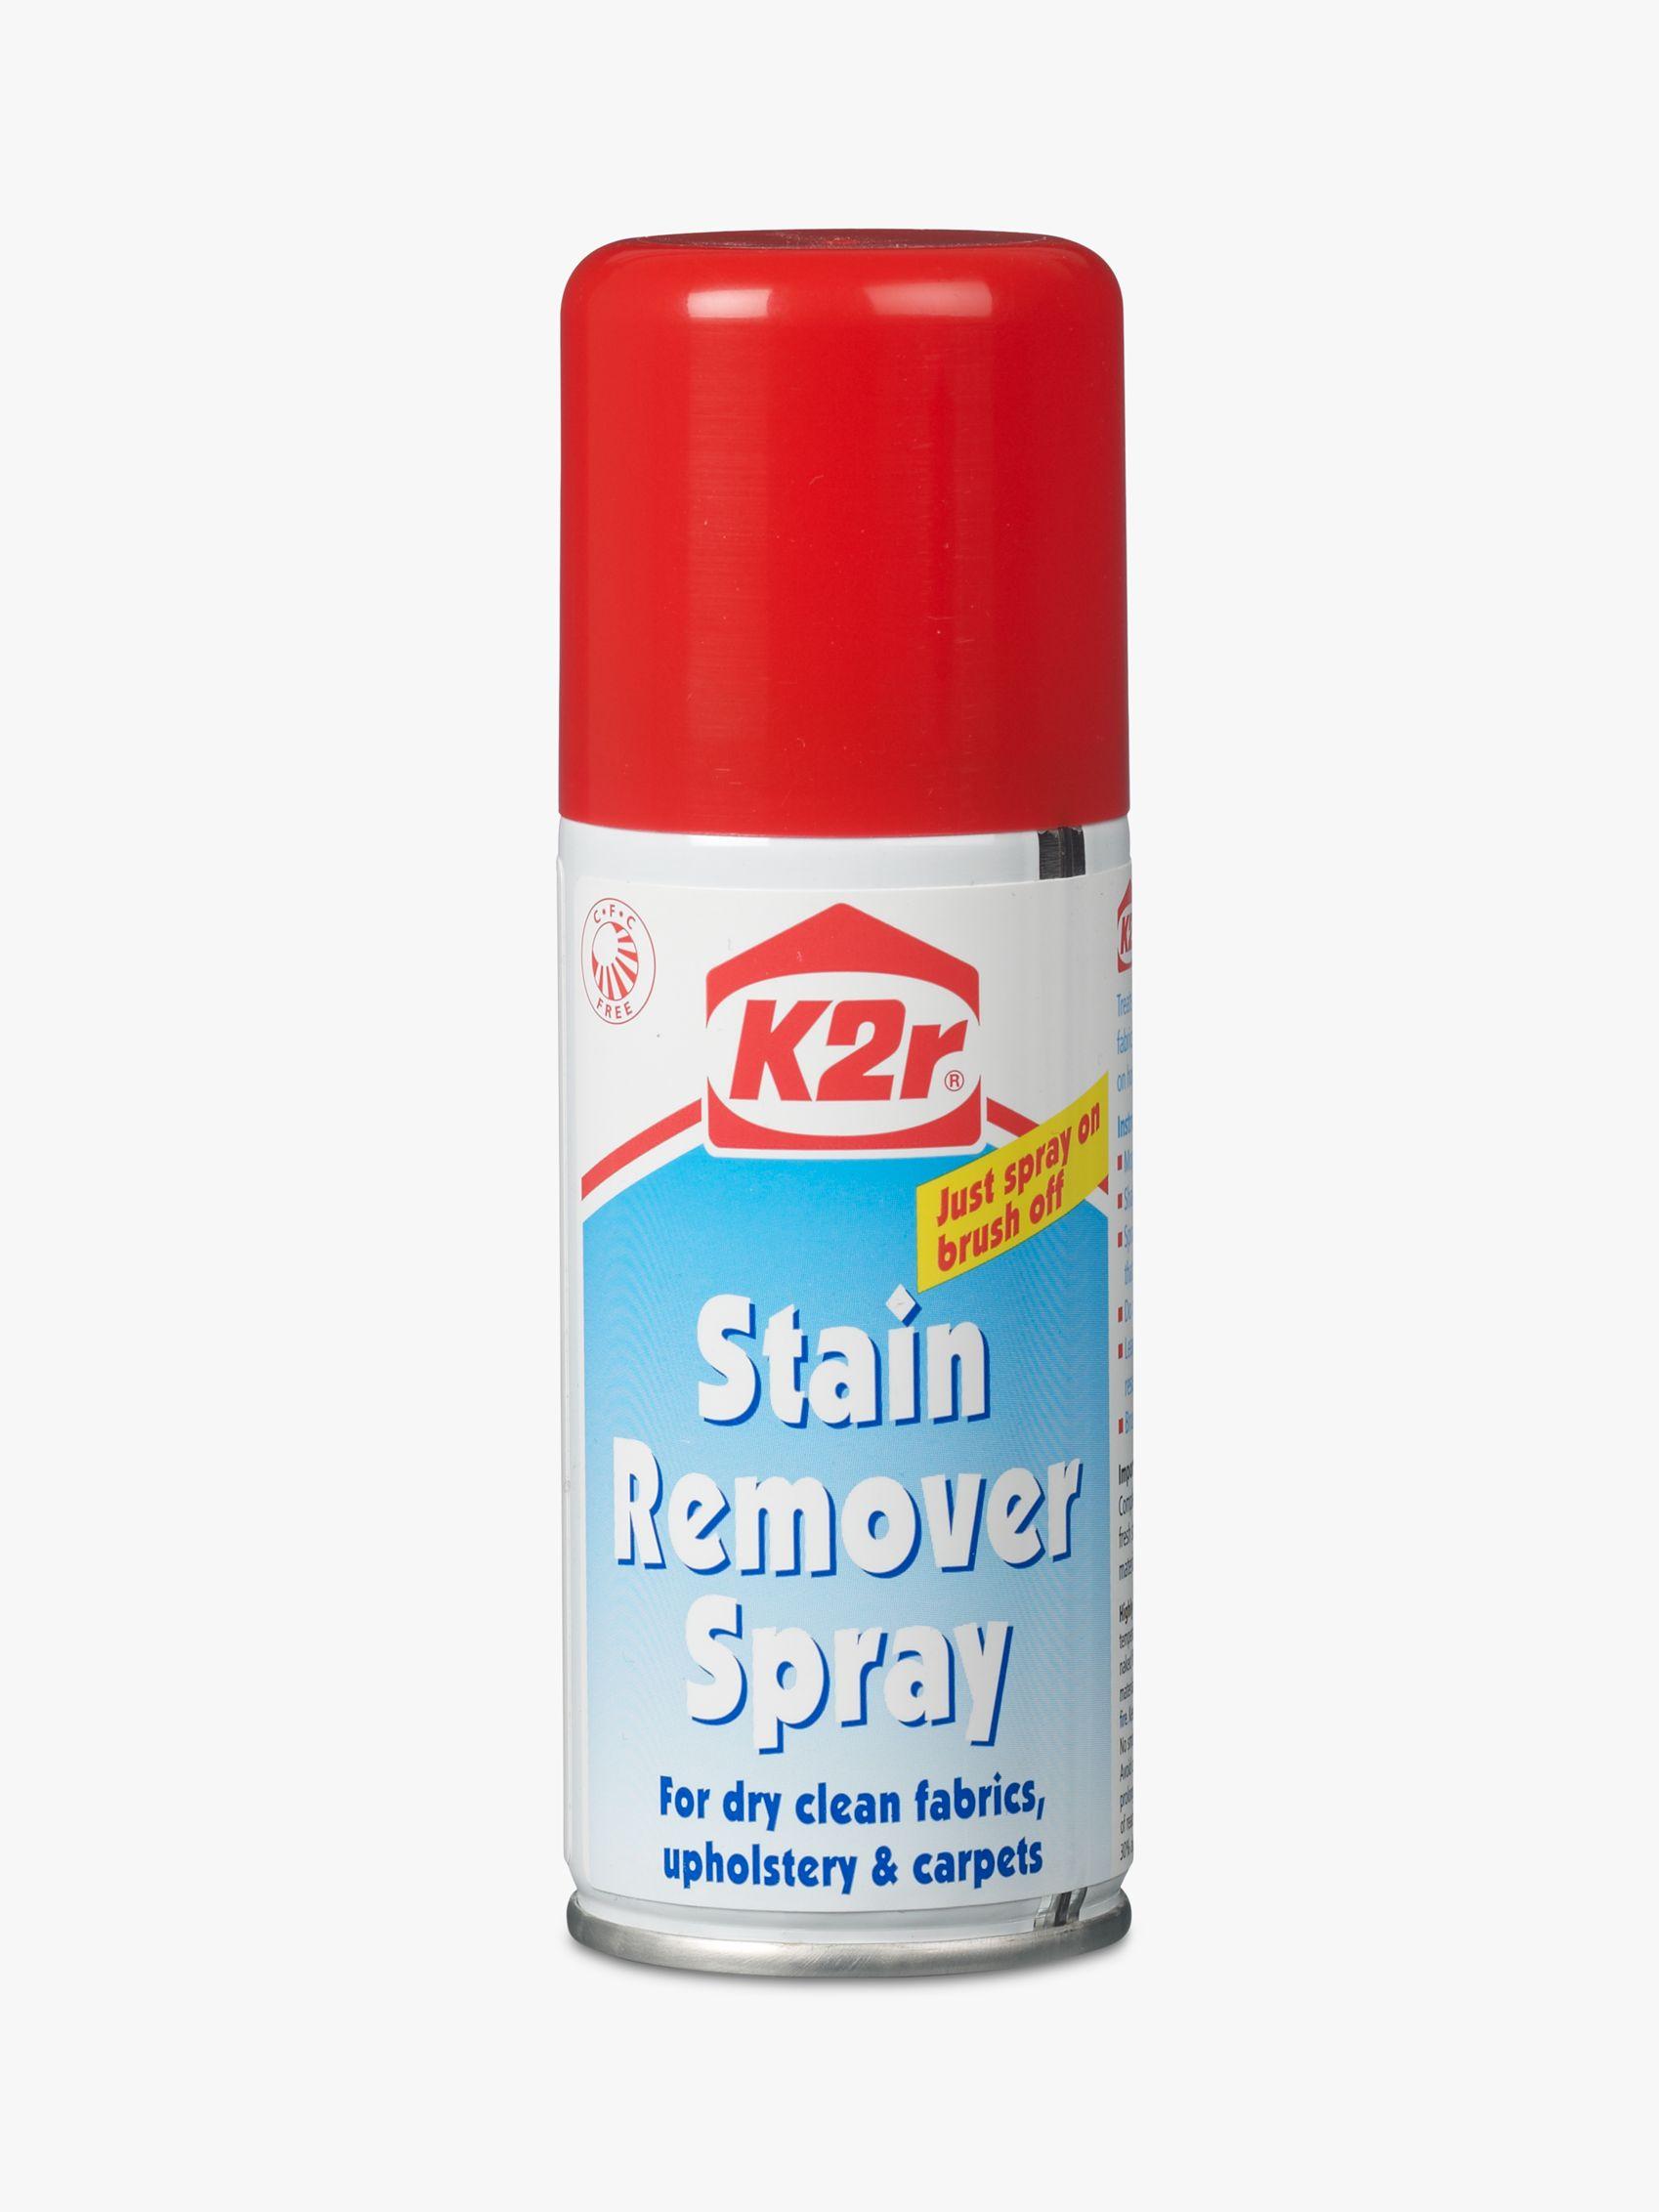 K2r K2r Stain Remover Spray, 100ml